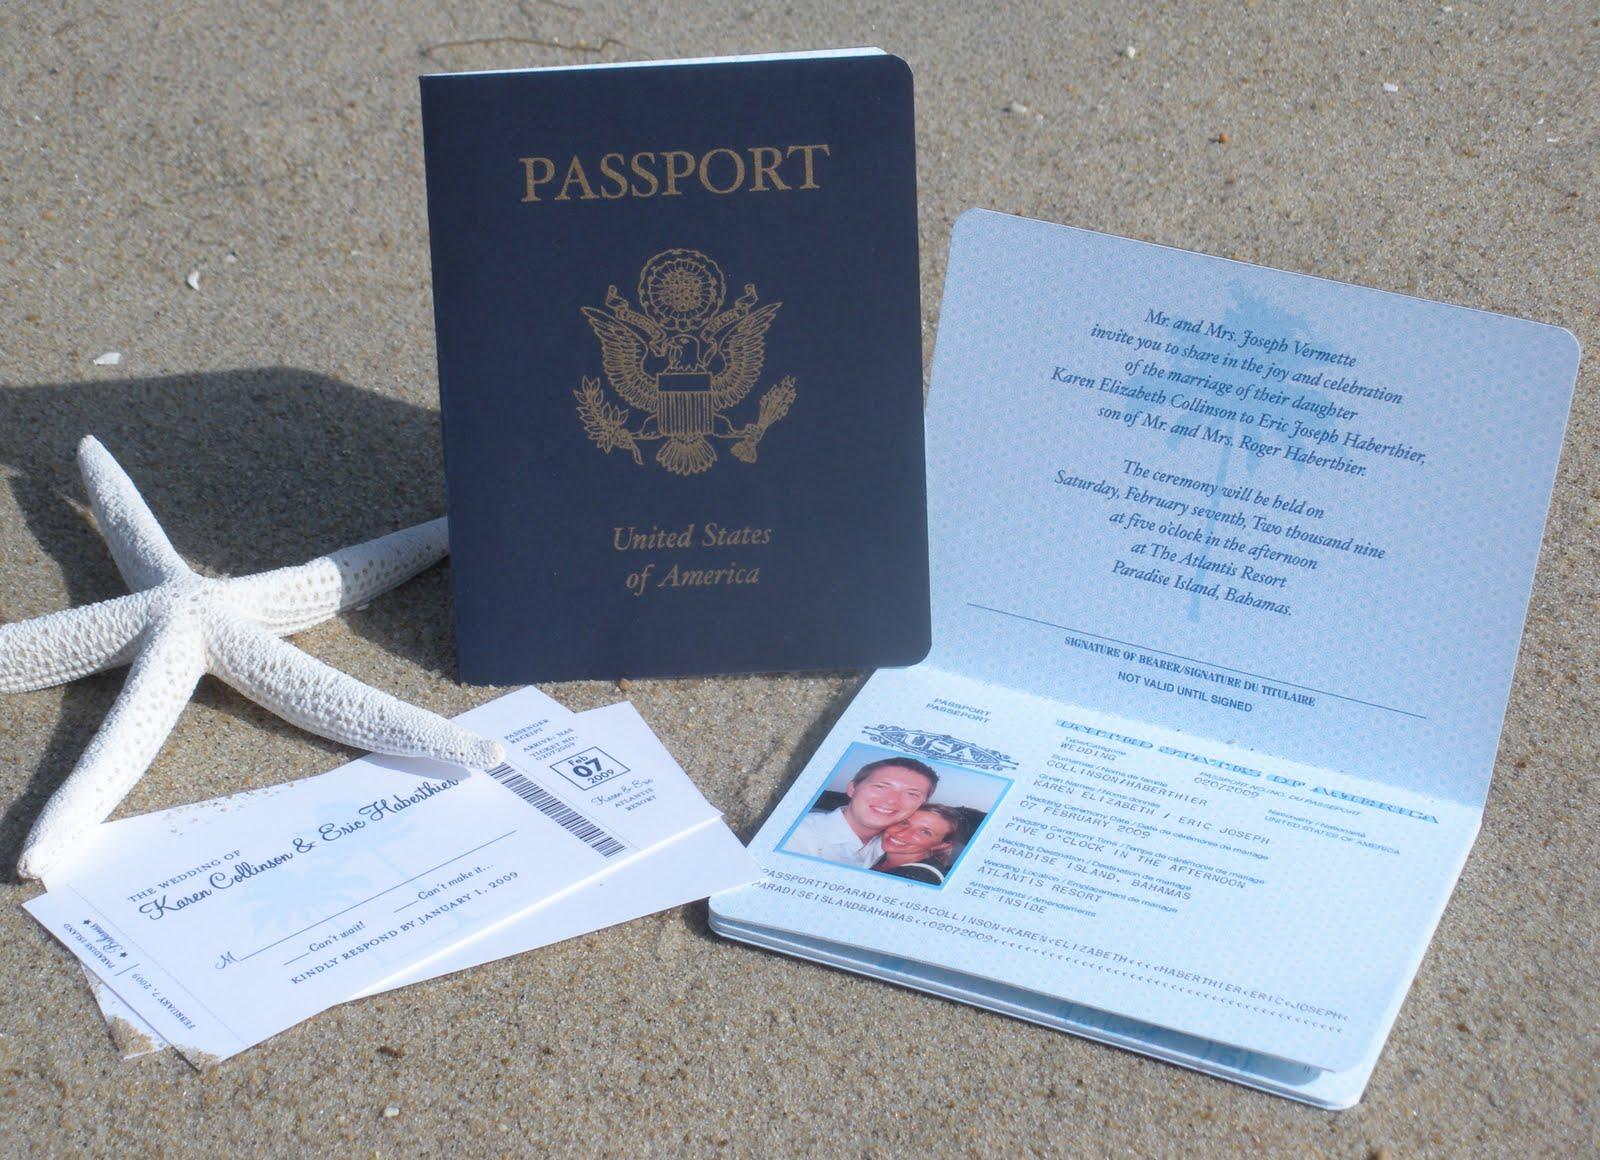 passport to atlantis destination wedding invitations Passport to Atlantis Destination Wedding Invitations